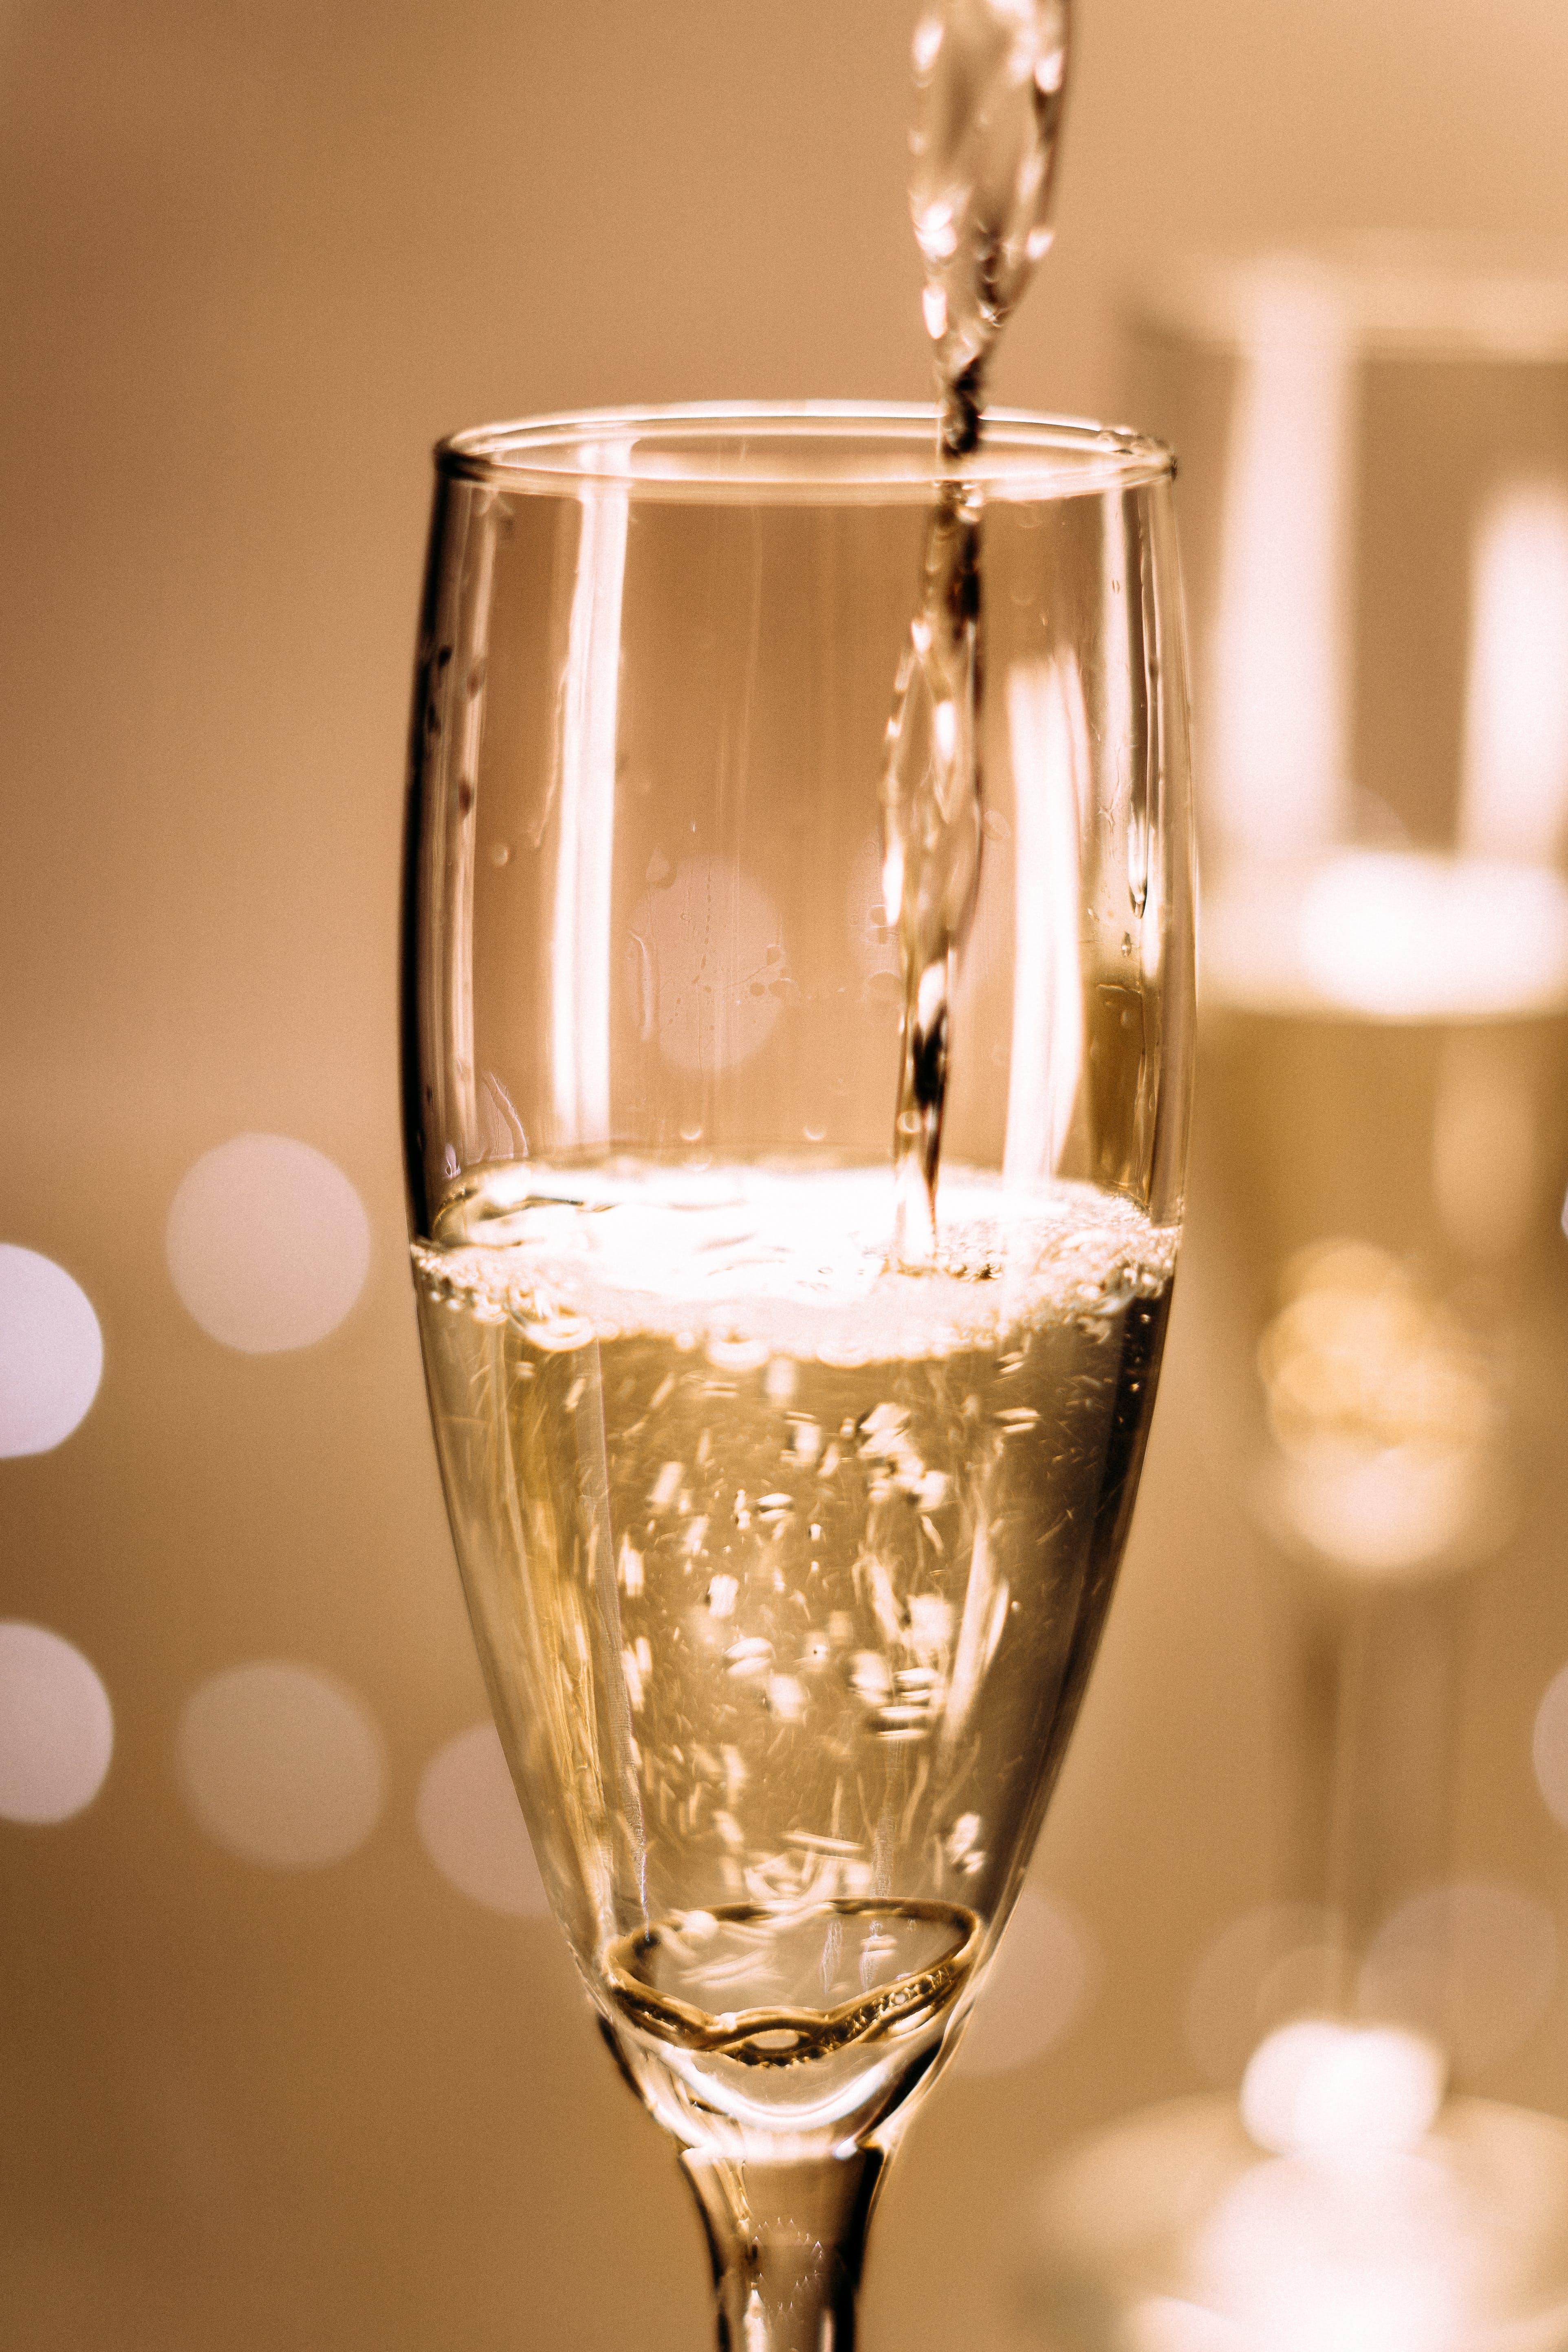 zu alkoholisches getränk, champagner, getränk, gießen